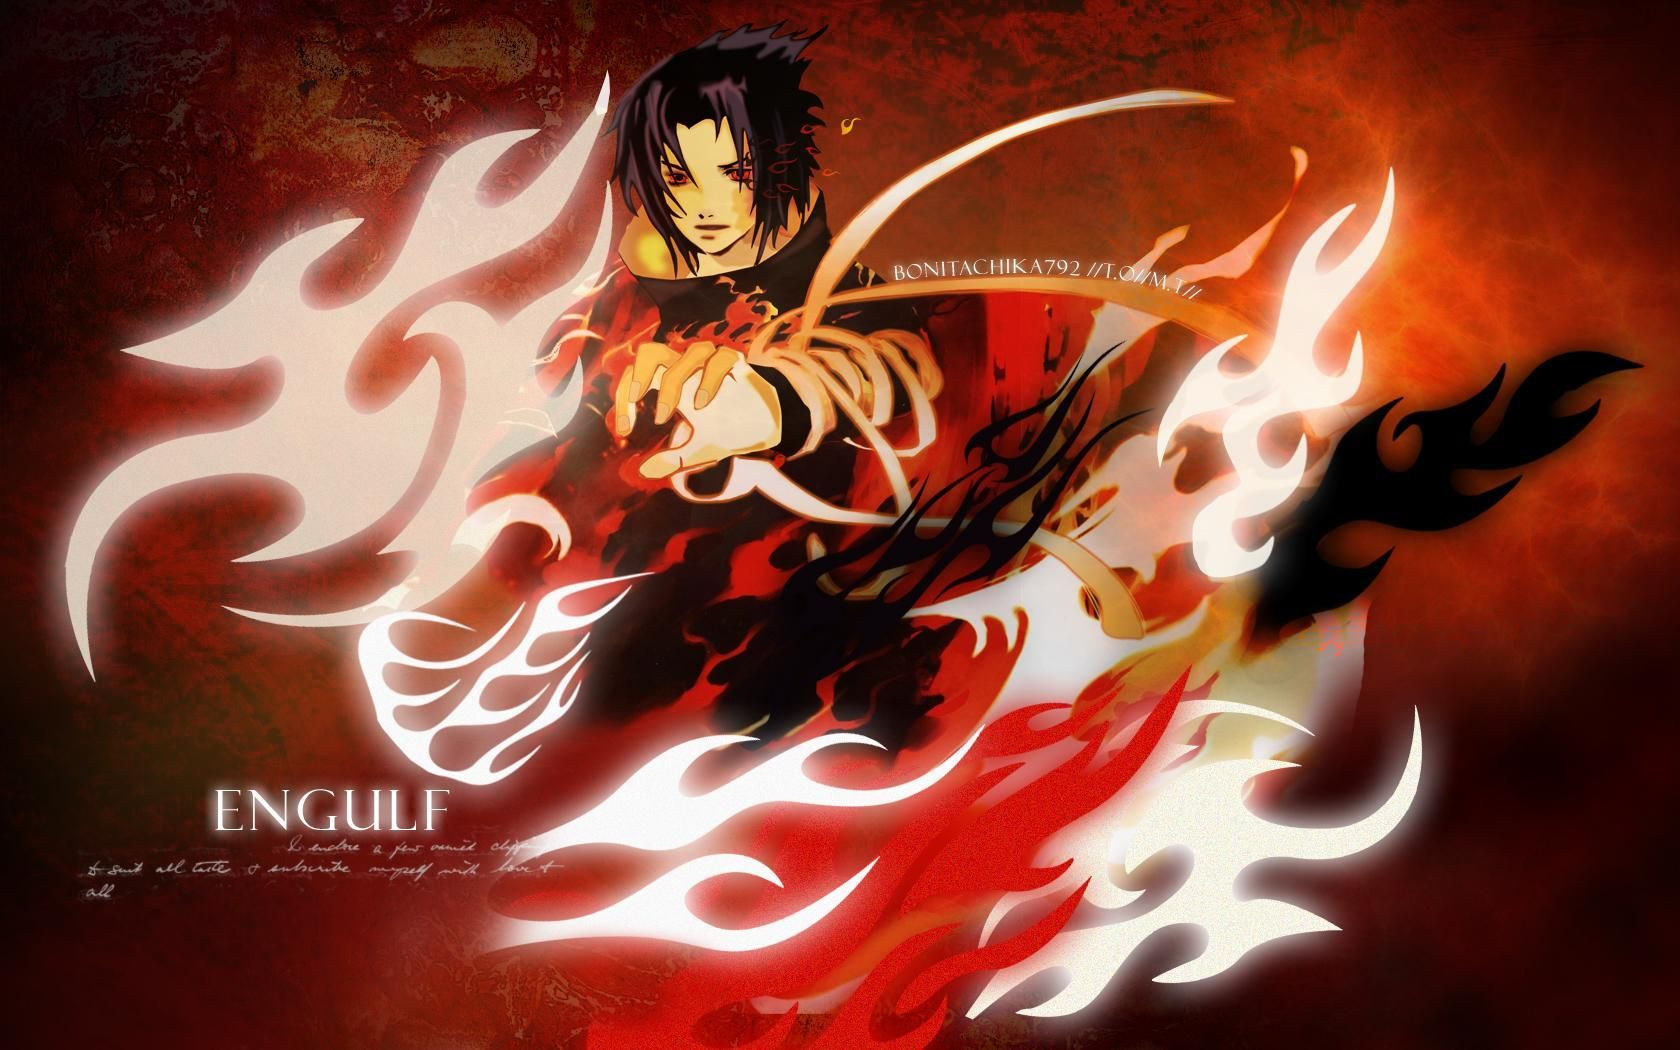 Gaara Naruto Hd Wallpapers Backgrounds Wallpaper